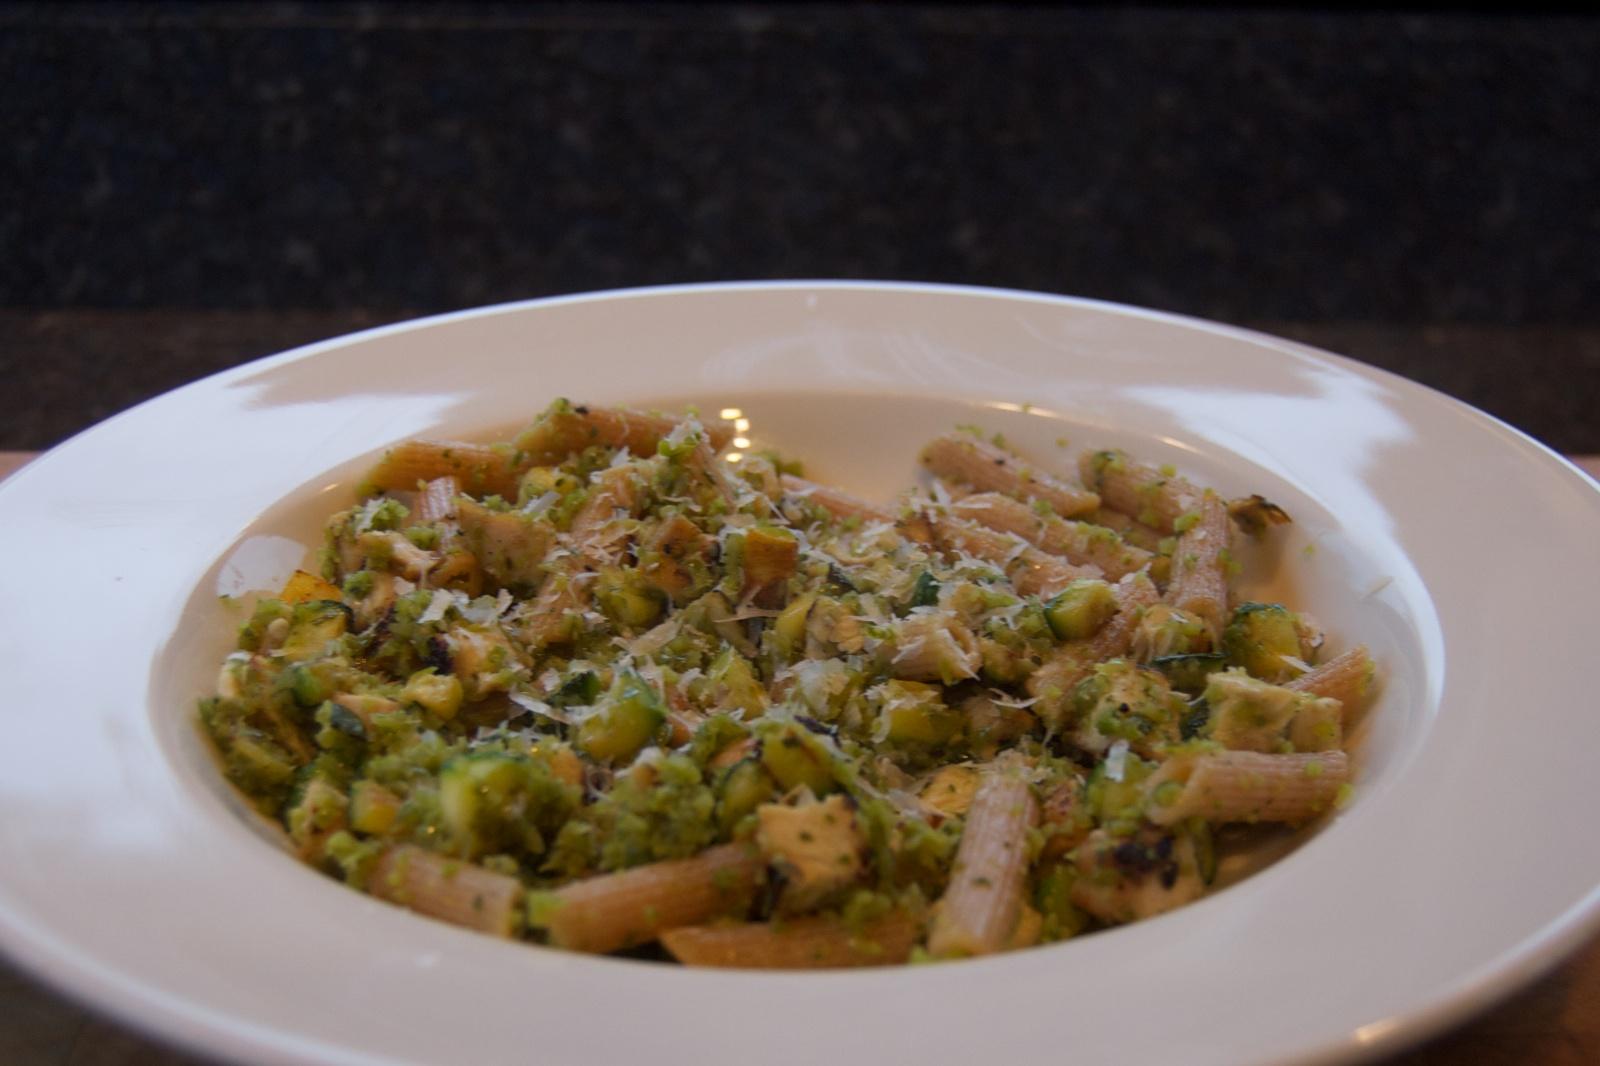 http://blog.rickk.com/food/2013/10/23/ate.2013.10.23.d.jpg